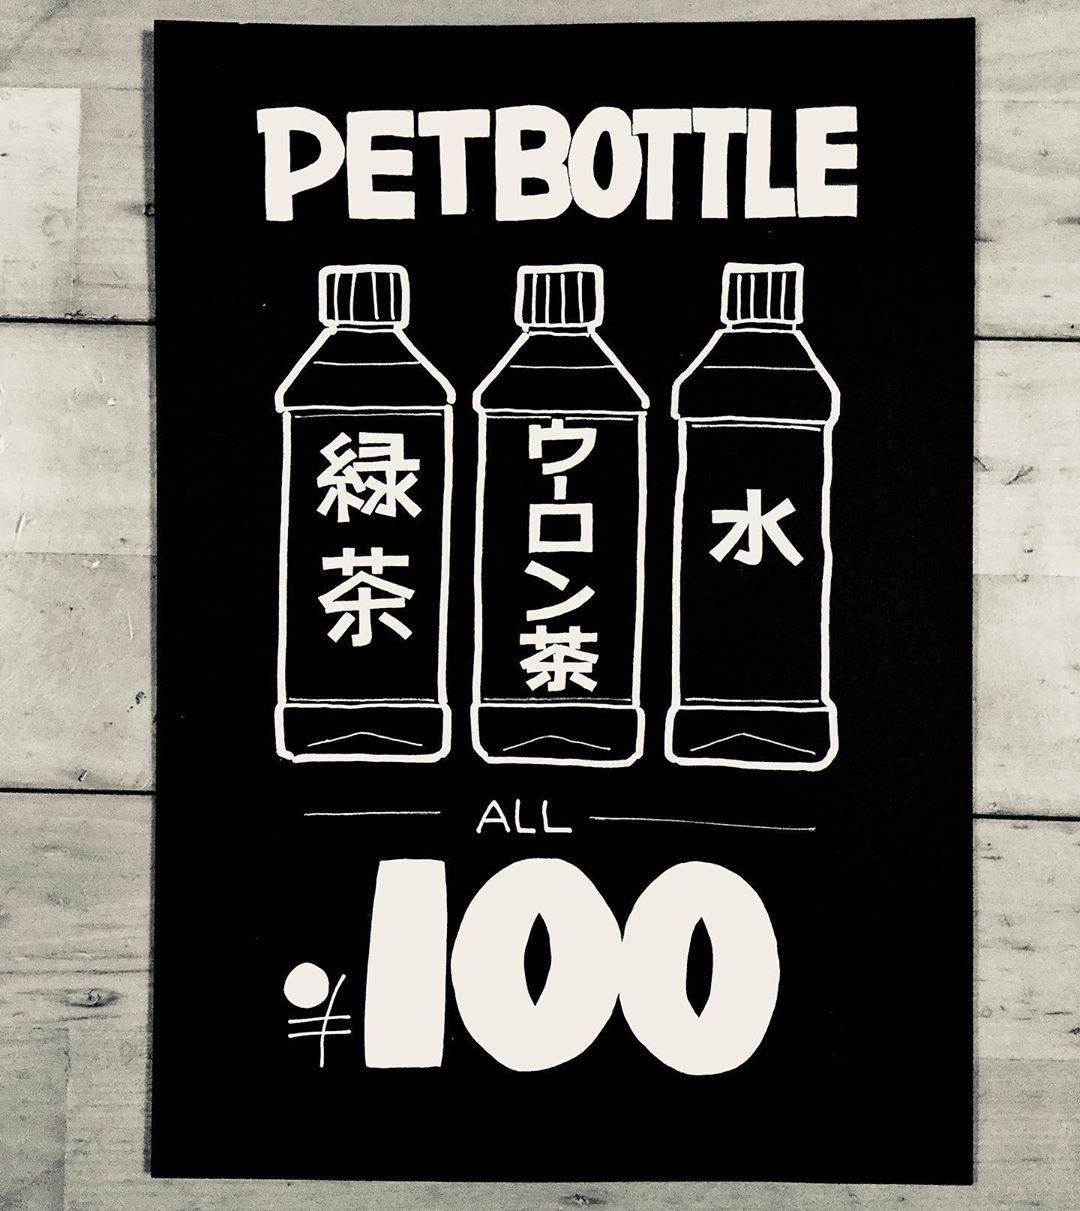 Yoko Take On Instagram ライブハウス用シリーズ 会場の雰囲気を壊さぬよう 壁と同じ黒で 手書きポップ 手書きpop 手描きポップ 手描きpop 手書き文字 手描き文字 手書きポスター 手描きポスター 手書きメニュー 手作りメニュー ドリンク 手書きポップ 手書き